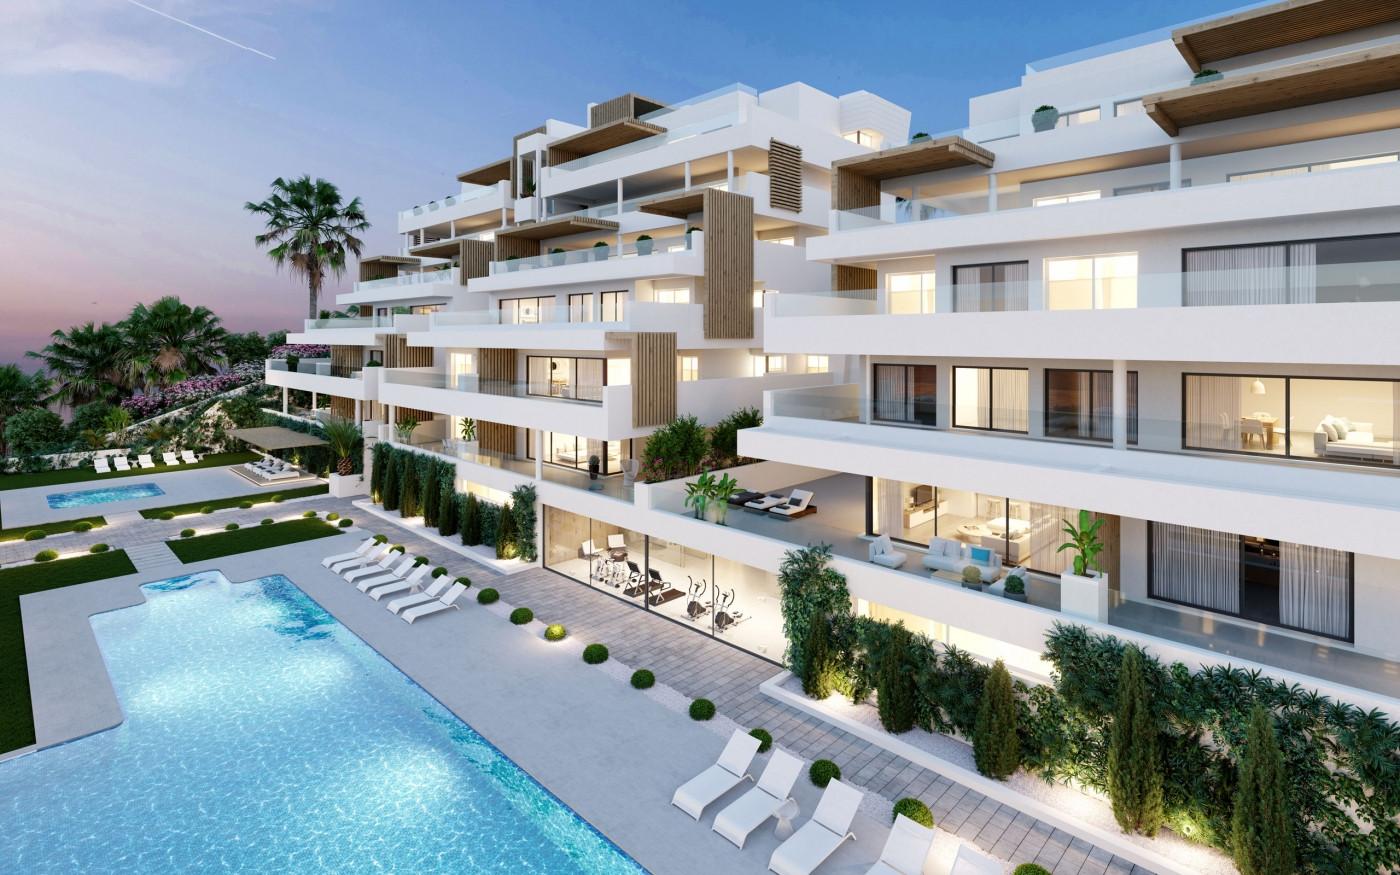 Moderne appartementen loopafstand strand, haven Estepona